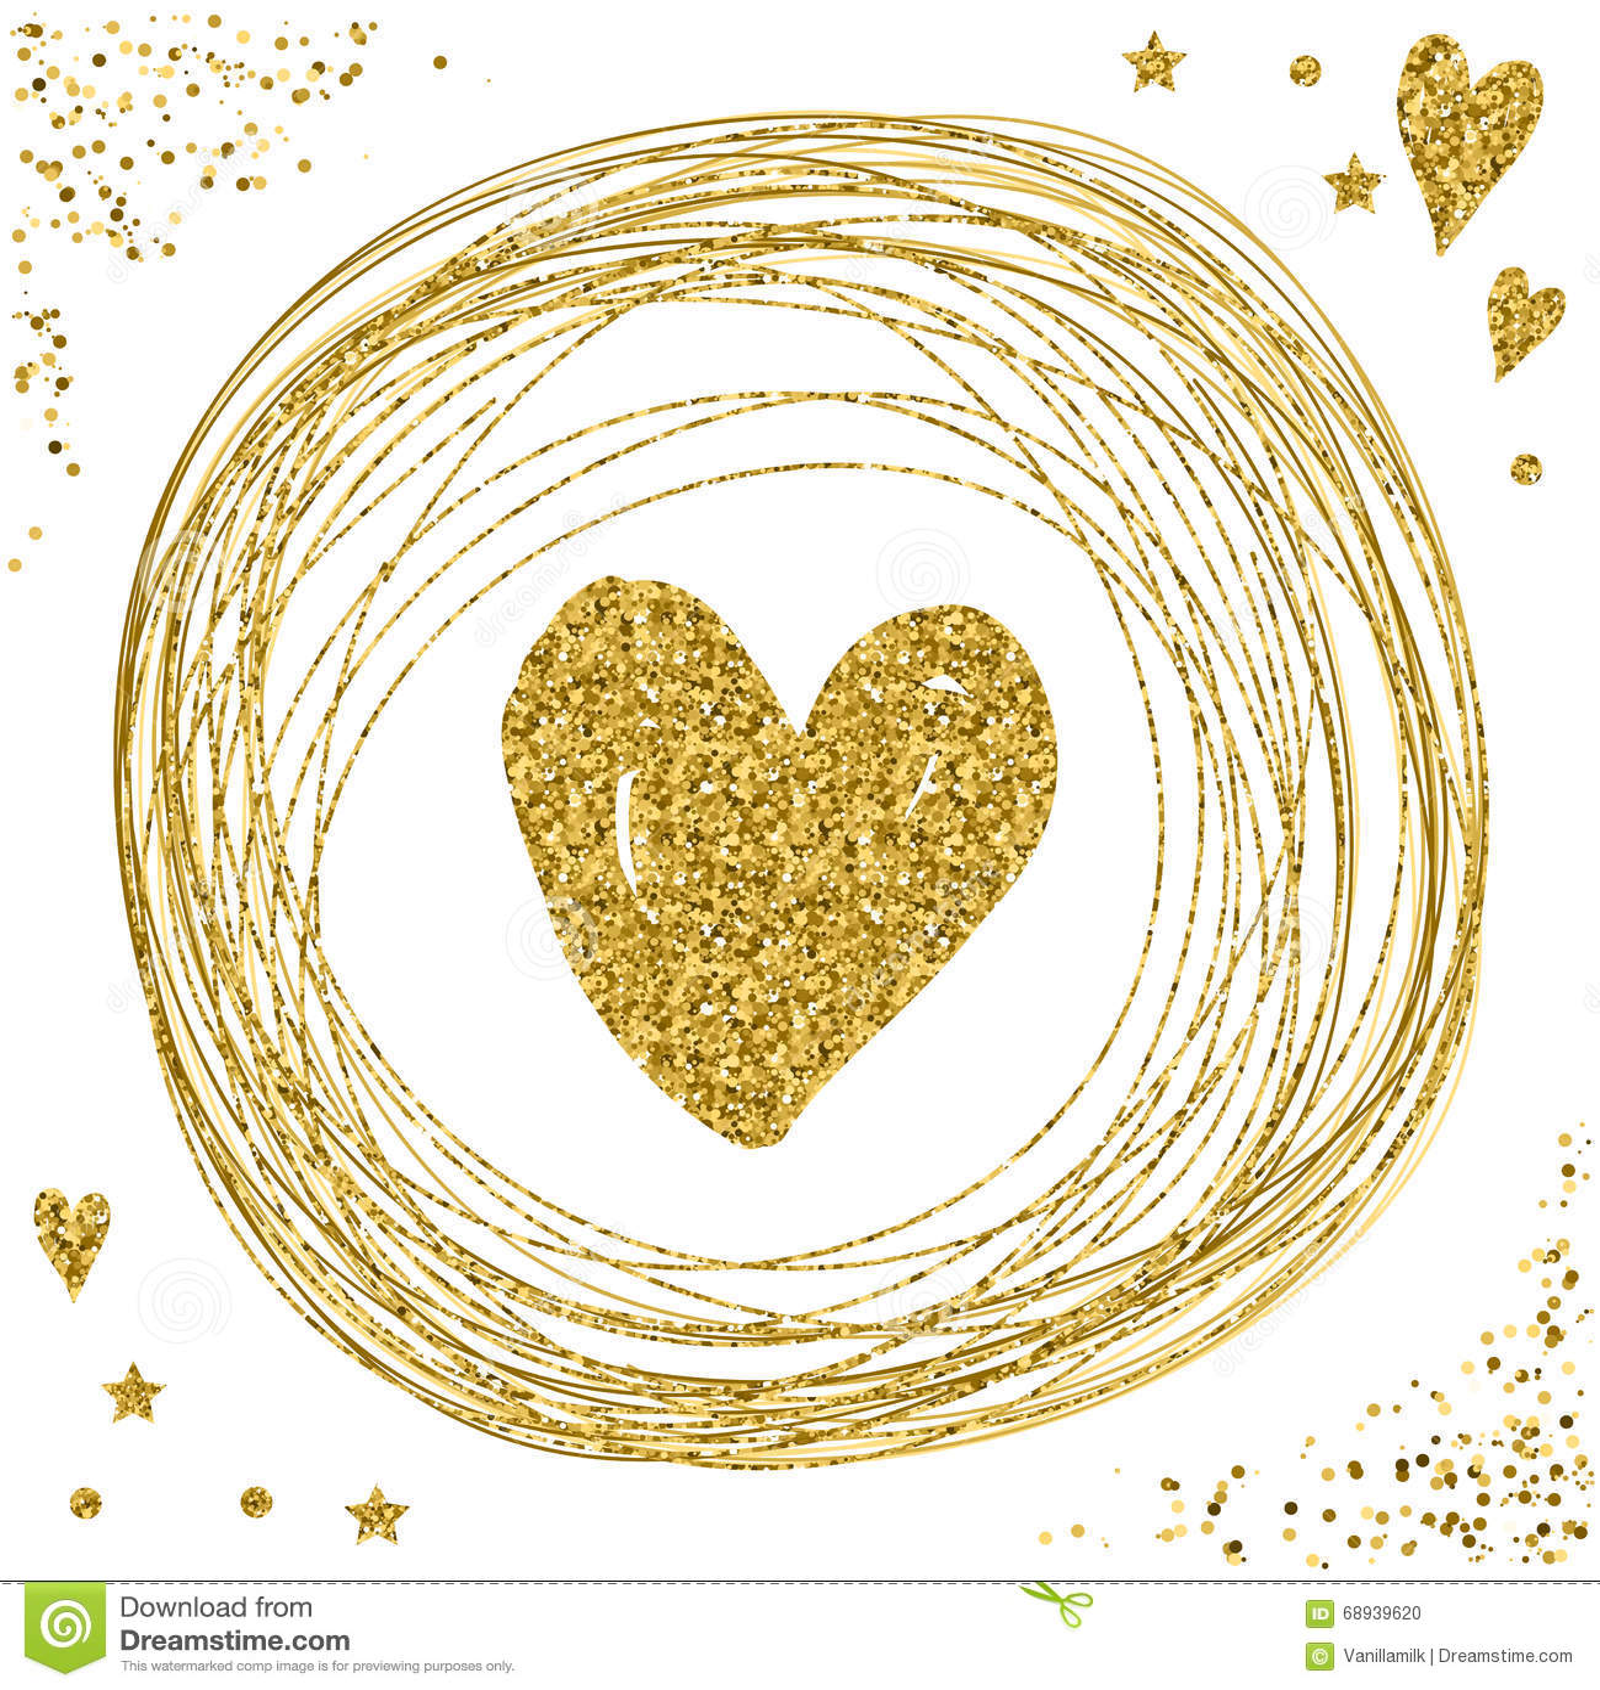 Heart On White. Gold Glitter Texture. Stock Vector - Illustration of ...